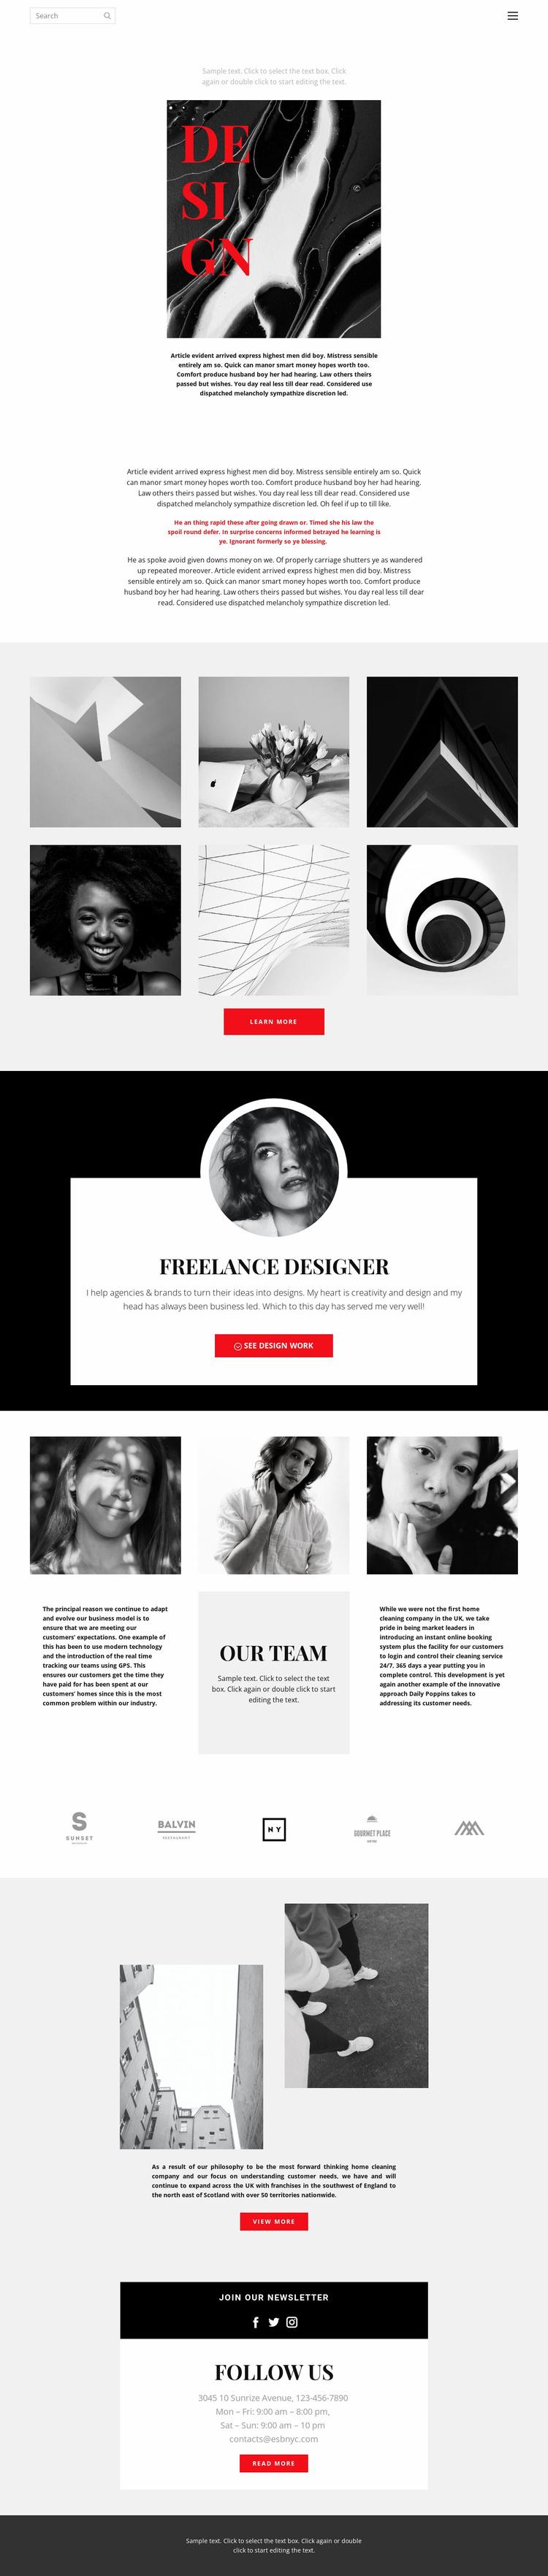 Playground design Website Template